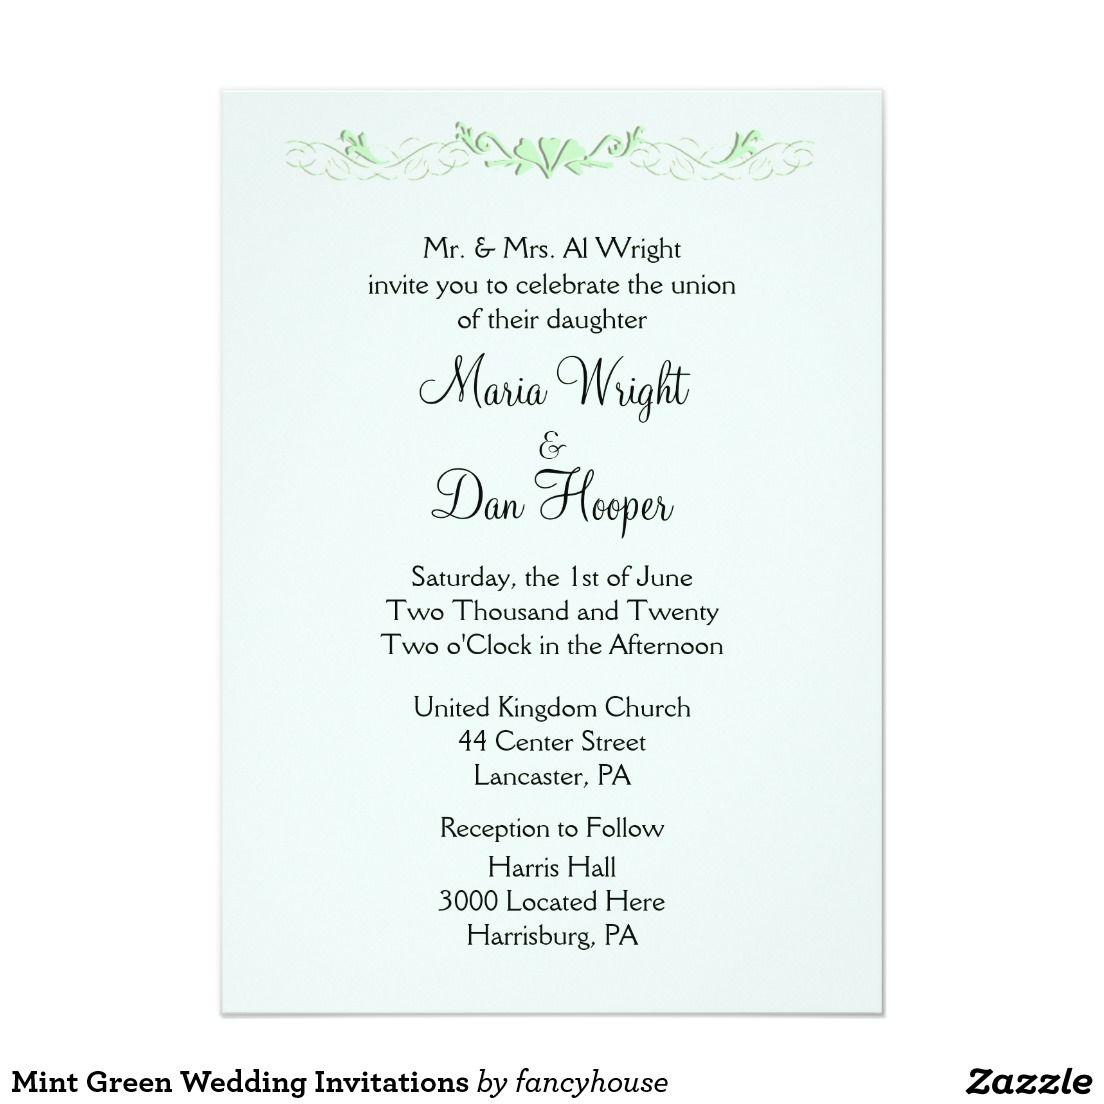 Mint Green Wedding Invitations Mint Green Weddings Green Weddings